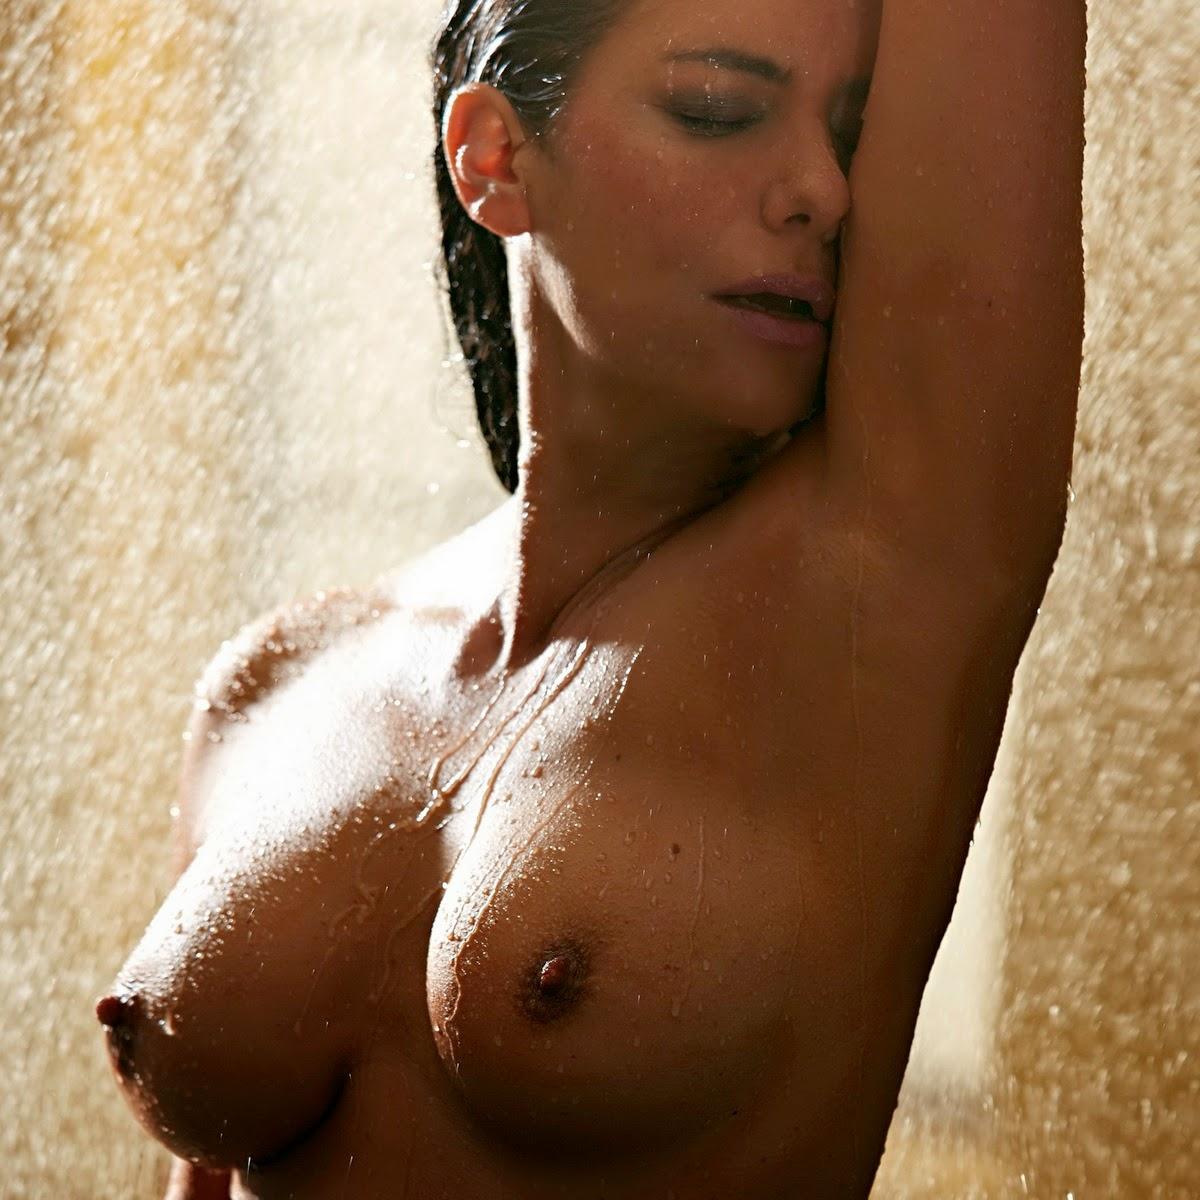 beauty celebrity Sandra Speichert from Rote Rosen nude